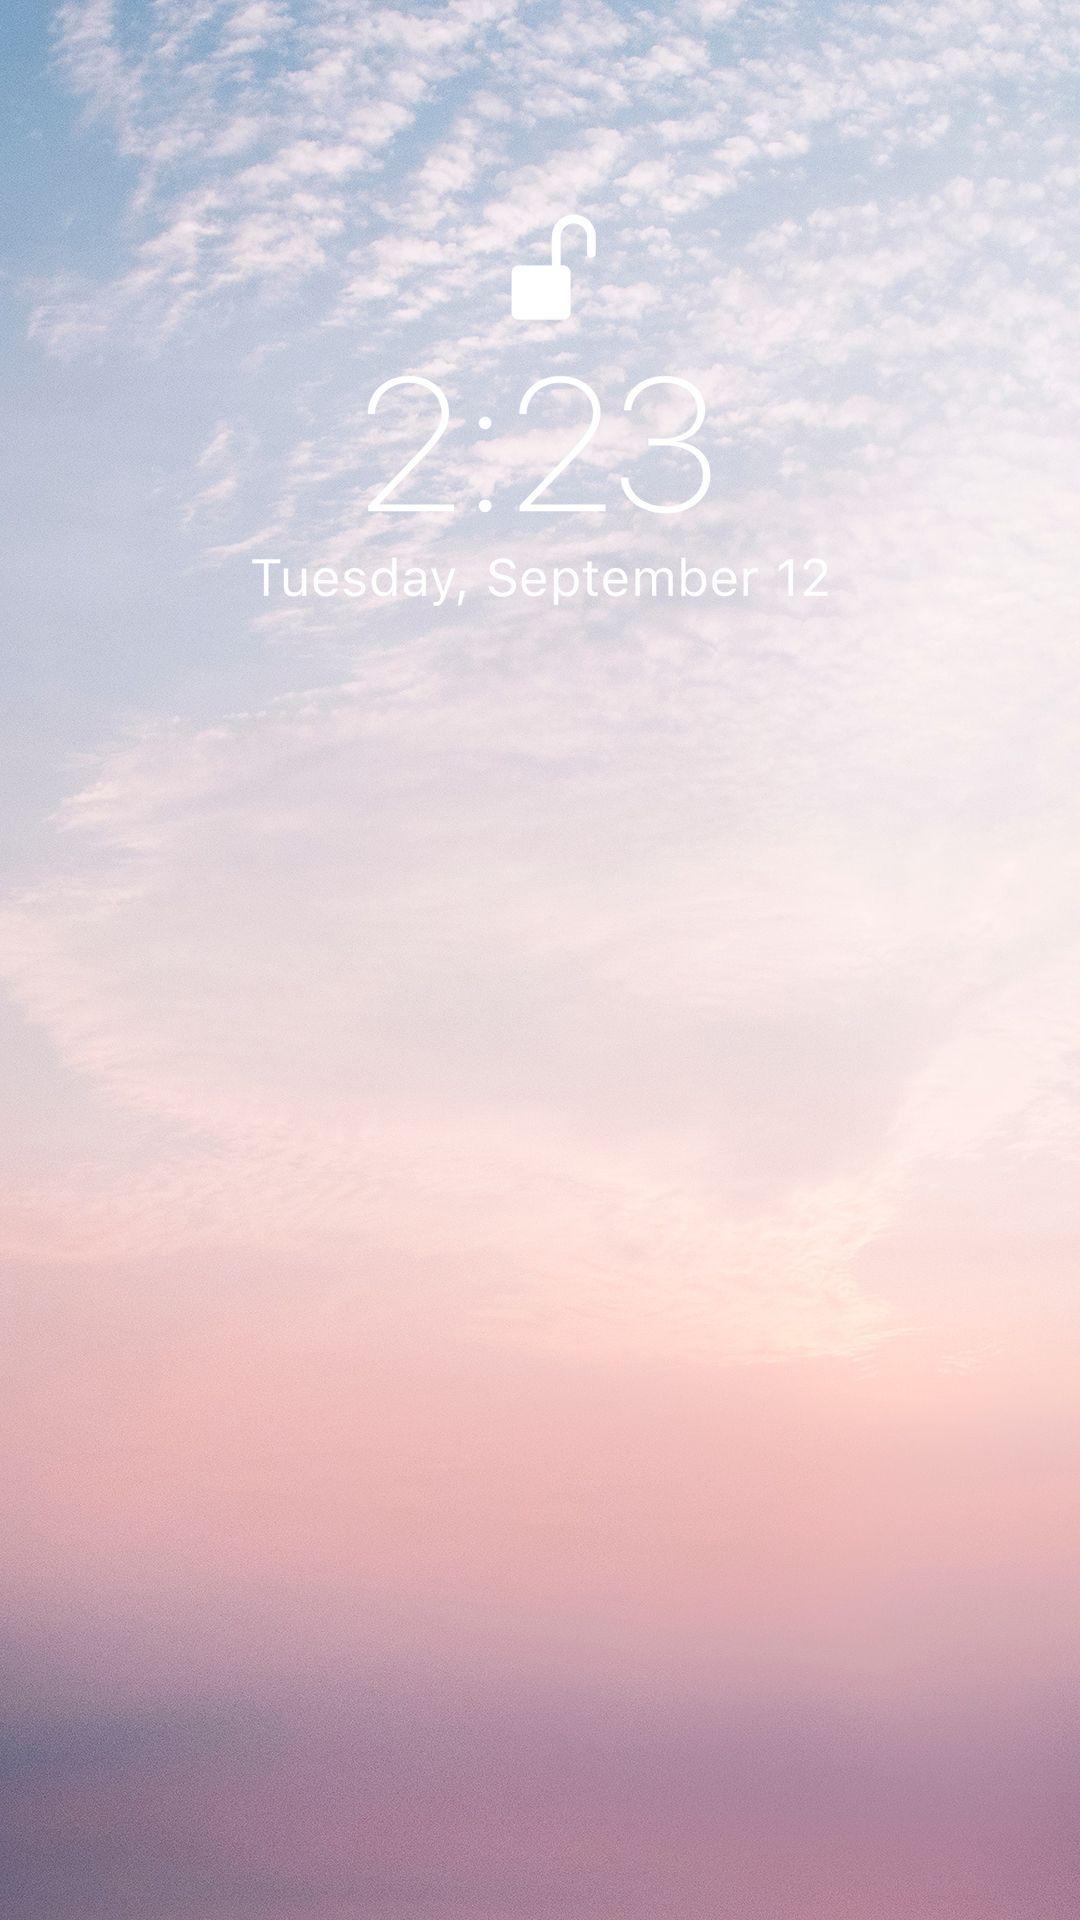 Amazing Sky Wallpaper In 2020 Cute Tumblr Wallpaper Wallpaper Iphone Cute Nature Iphone Wallpaper